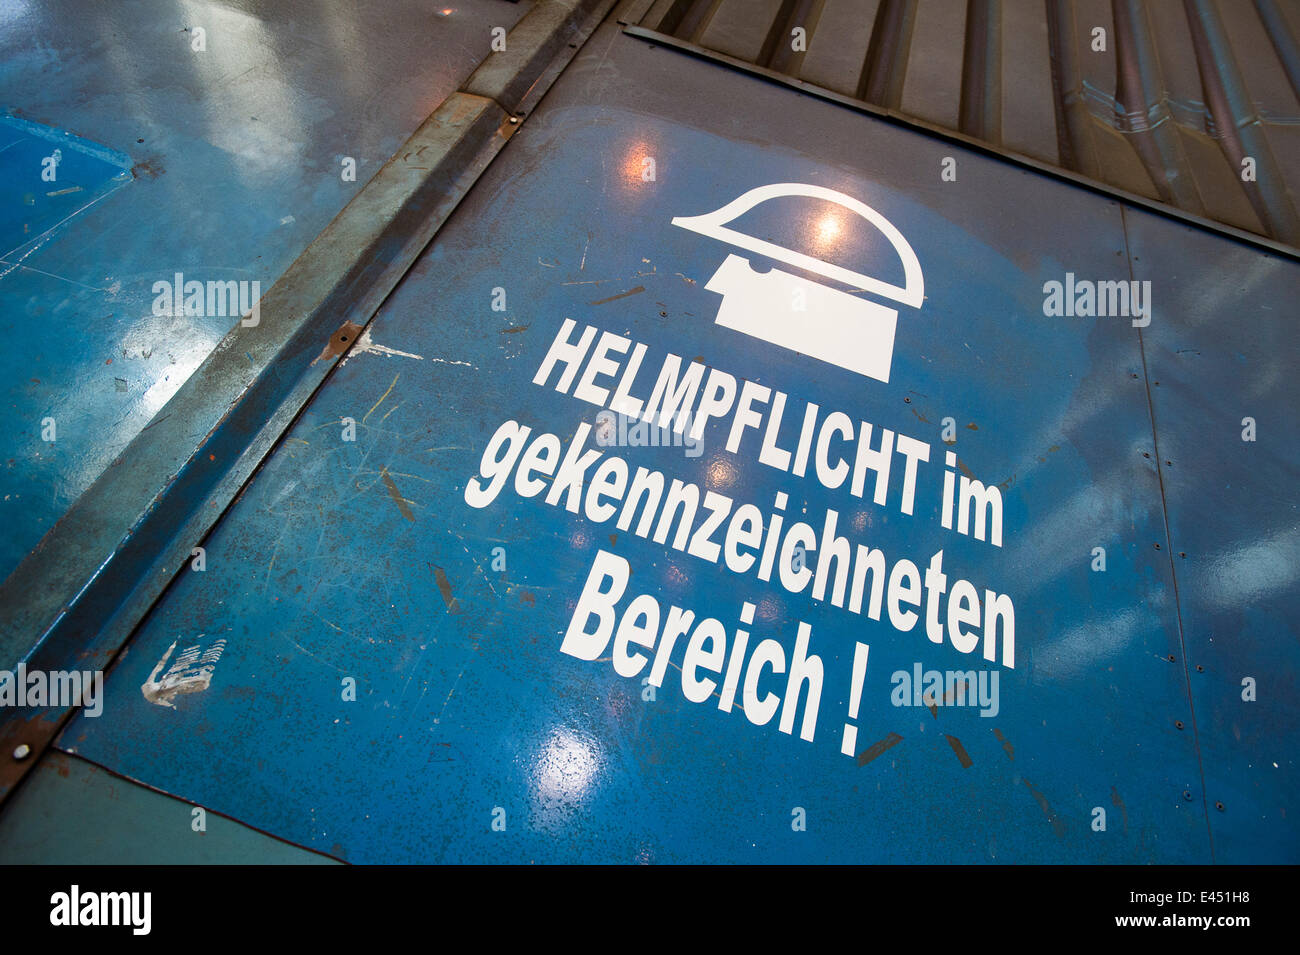 Avviso sulla salute e sulla sicurezza, hard hat area, Neunfelder Maschinenfabrik, NMF, Amburgo, Germania Immagini Stock